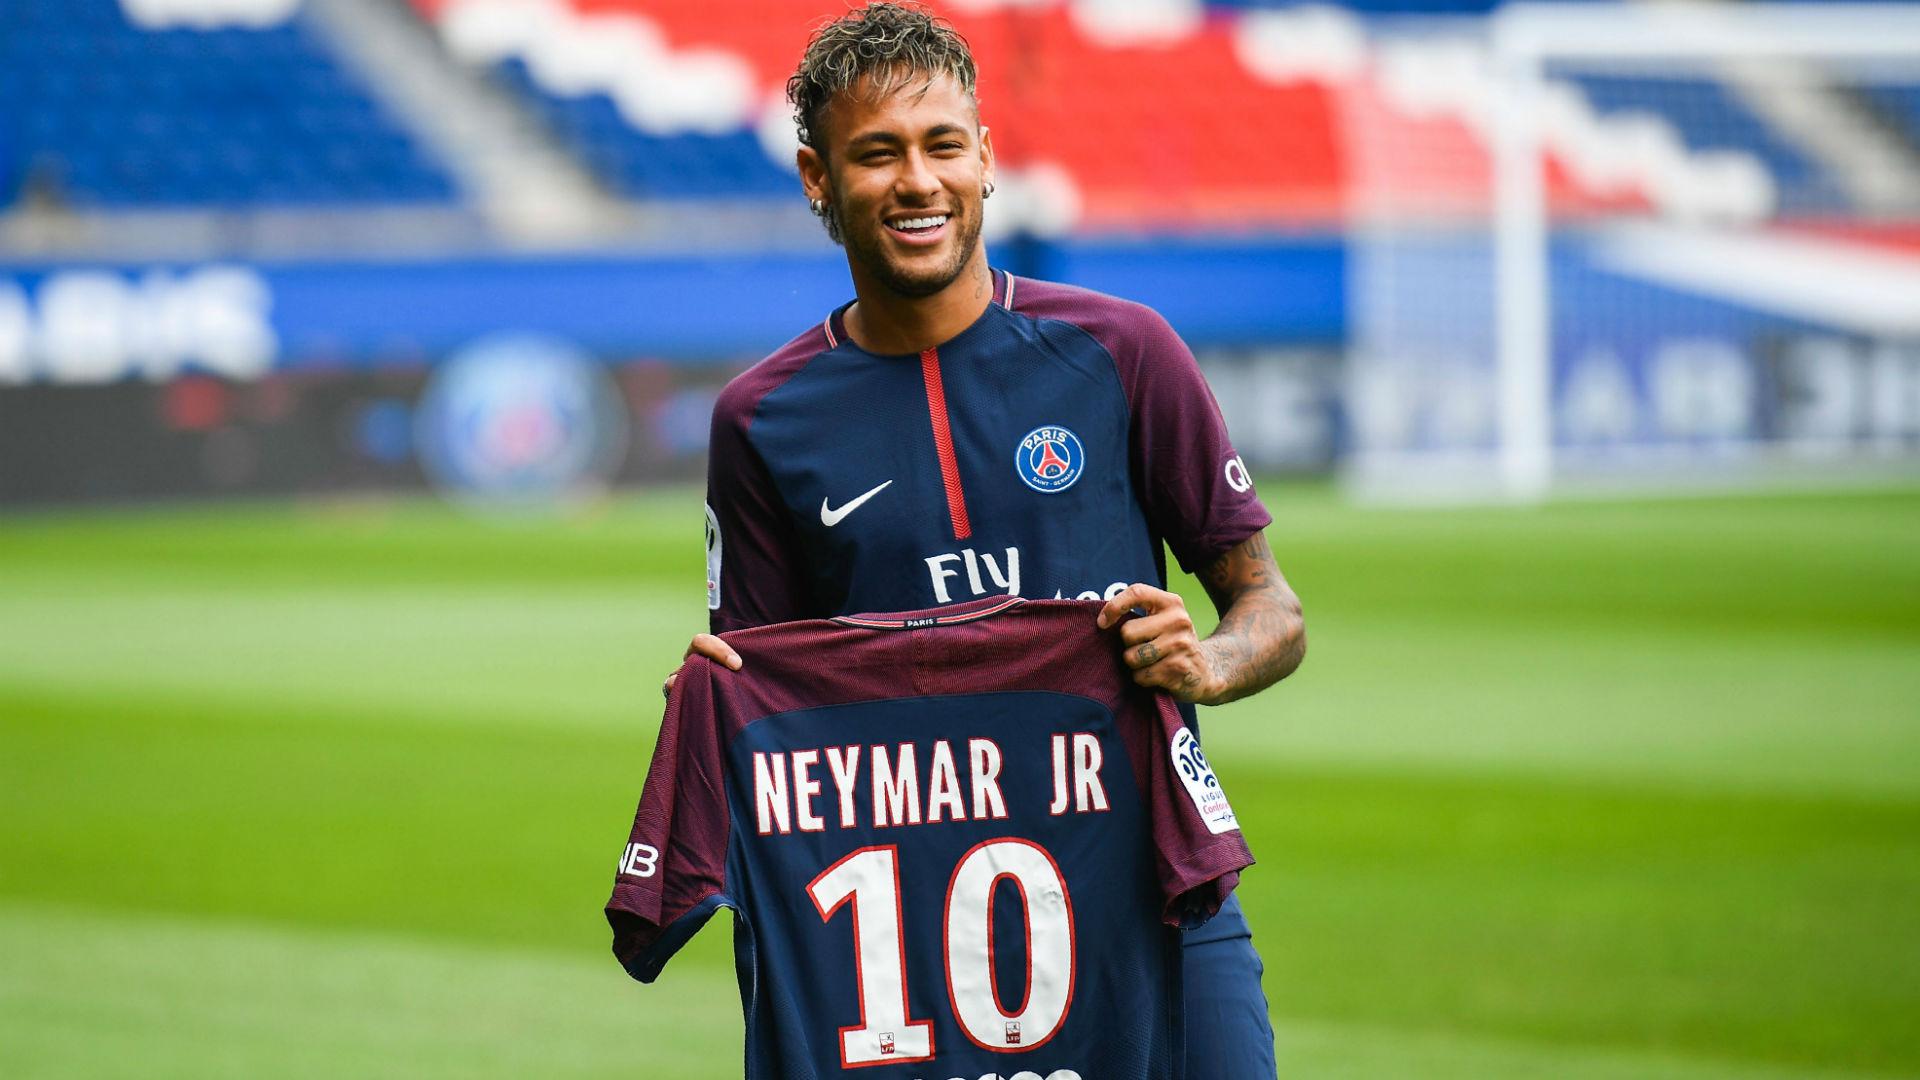 Bienvenue, Neymar   Case of the Mondays